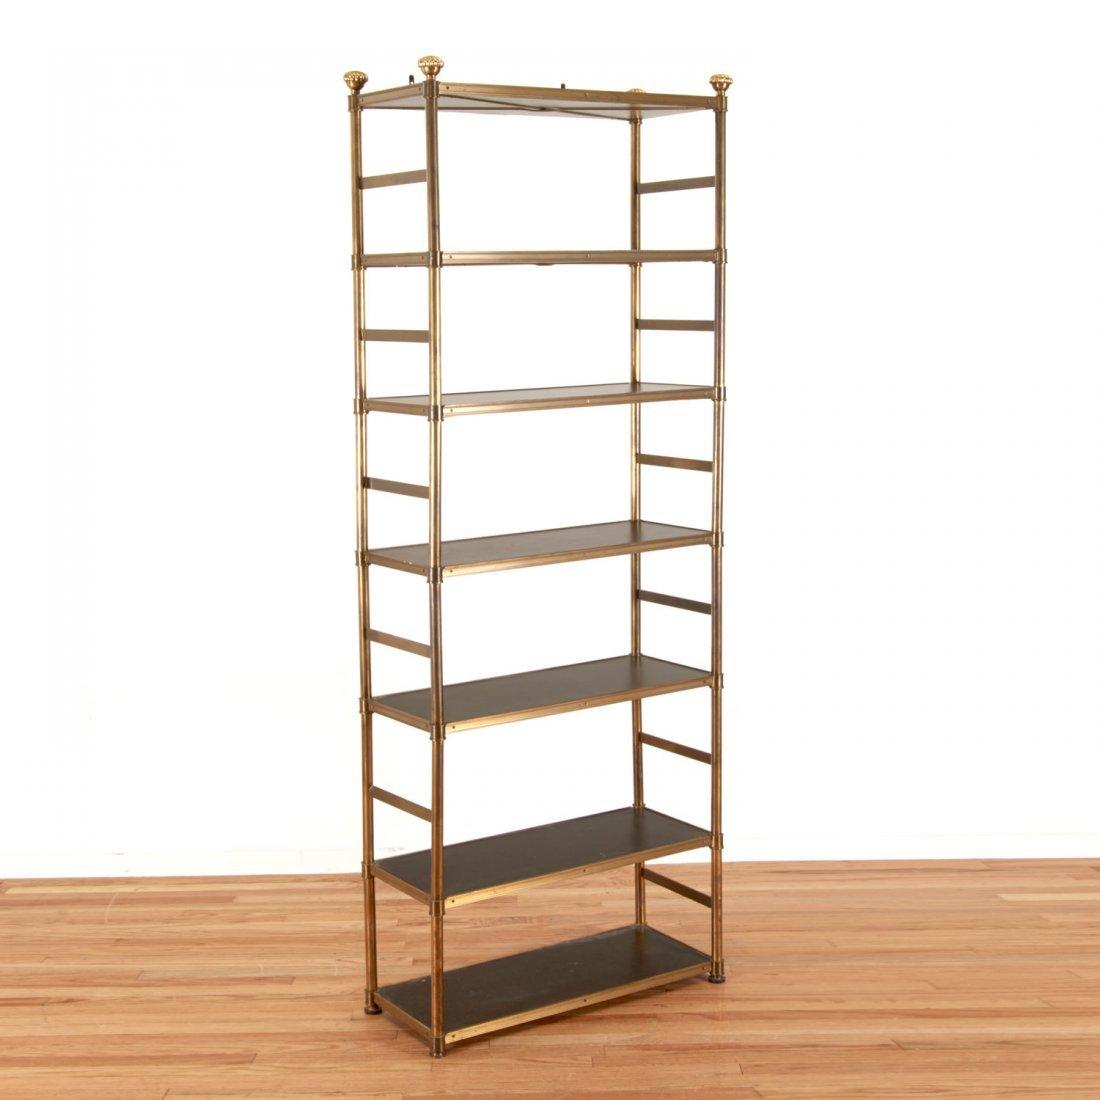 Attr. Maison Jansen brass, ebonized wood etagere